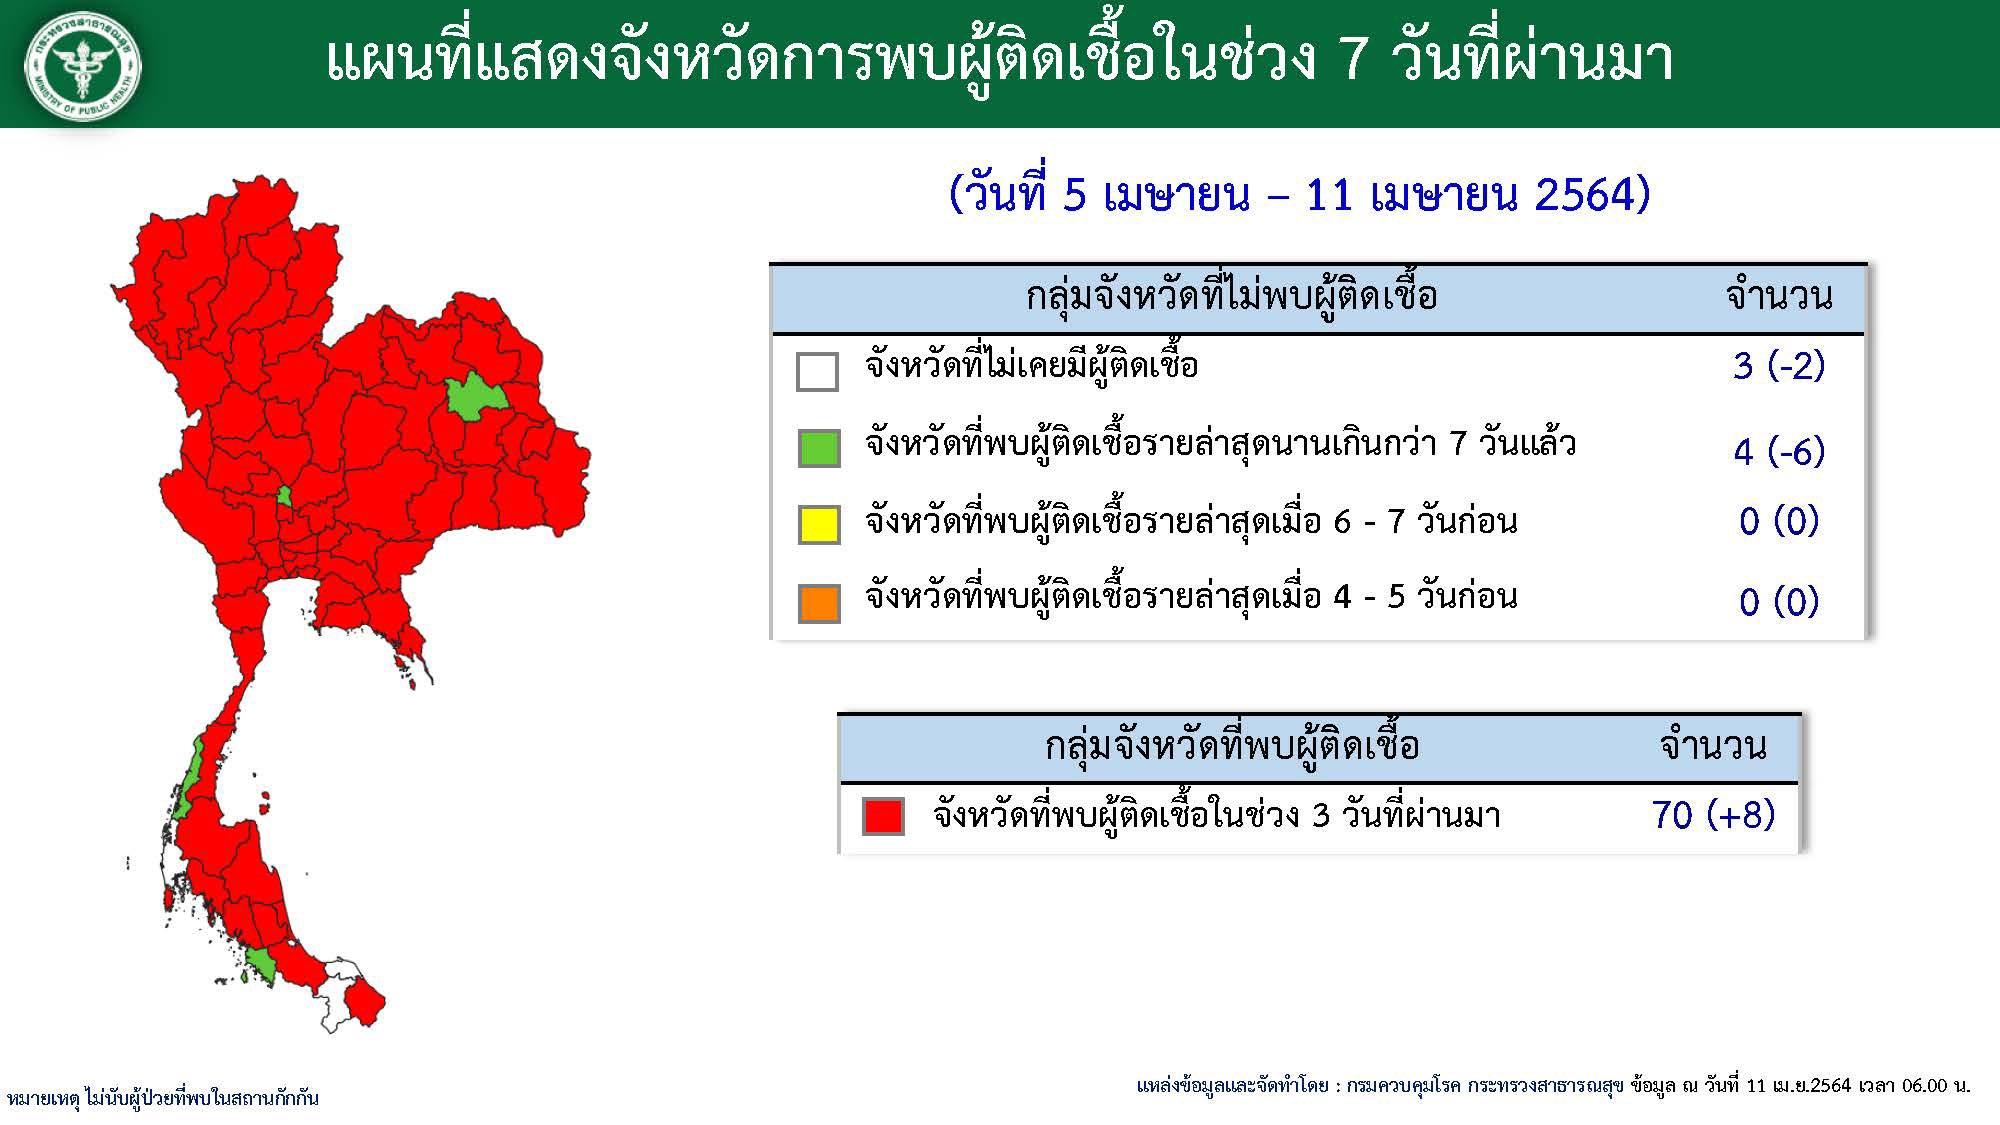 www.thaiguide.dk/images/forum/covid19/provinser%20med%20smittede.jpeg